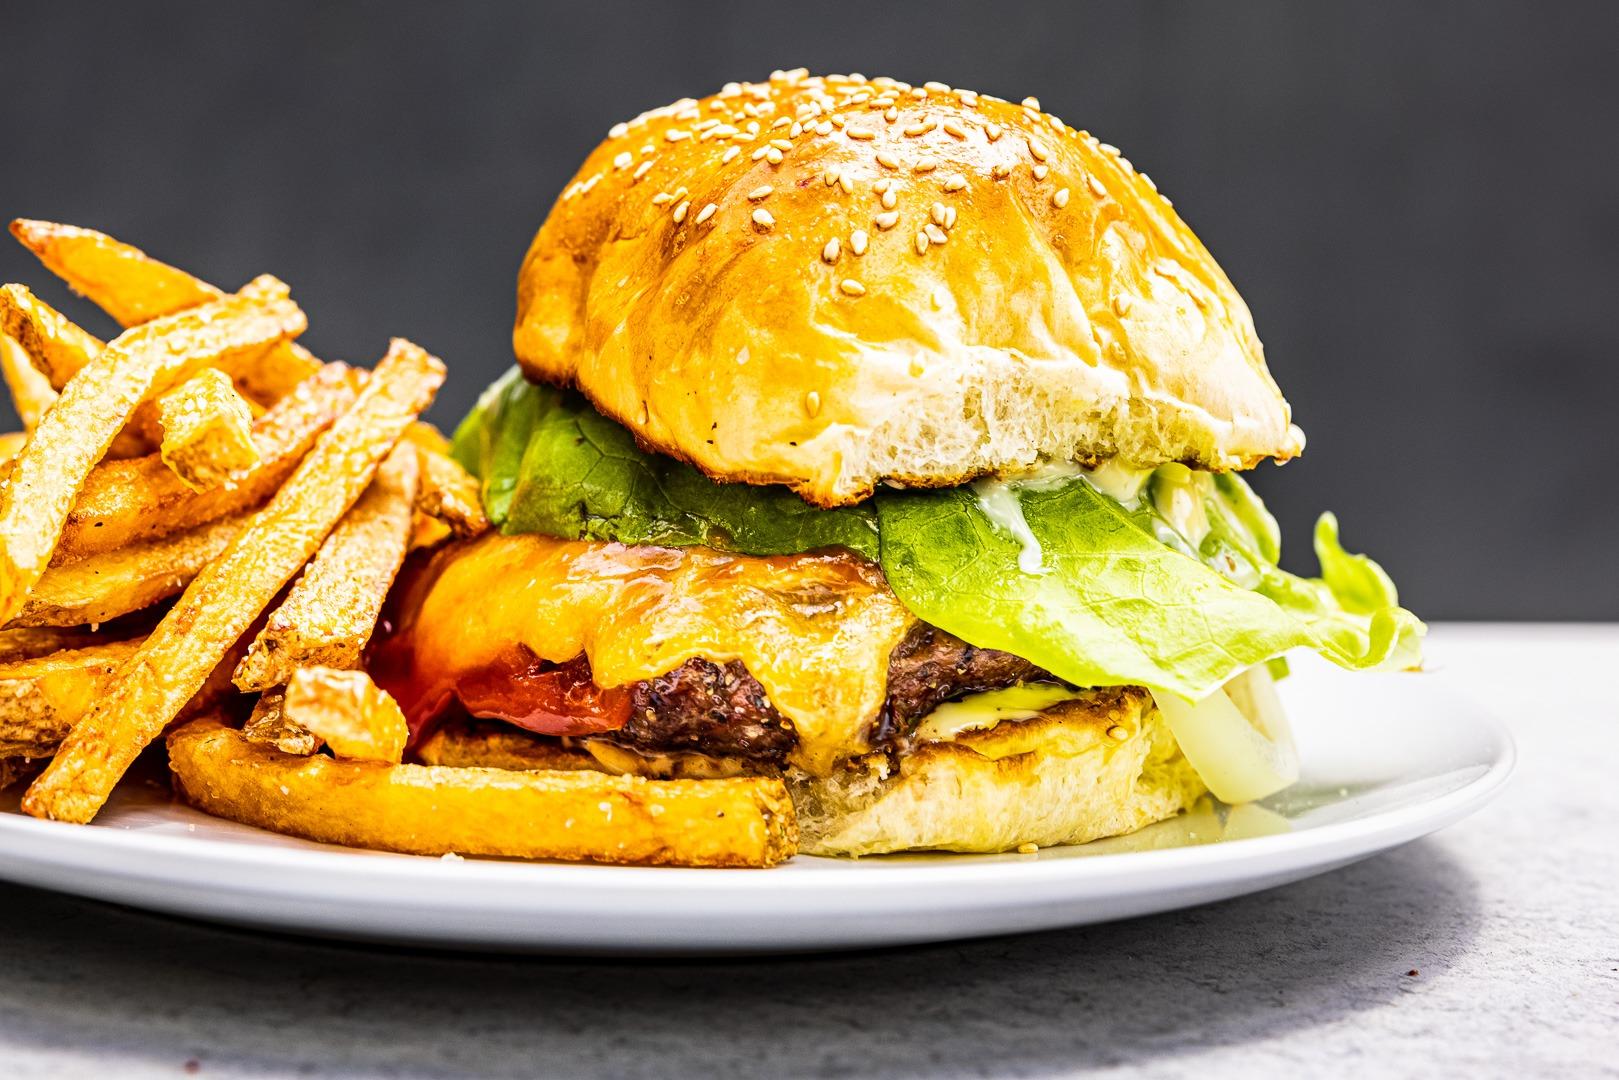 A perfect burger with a perfect bun